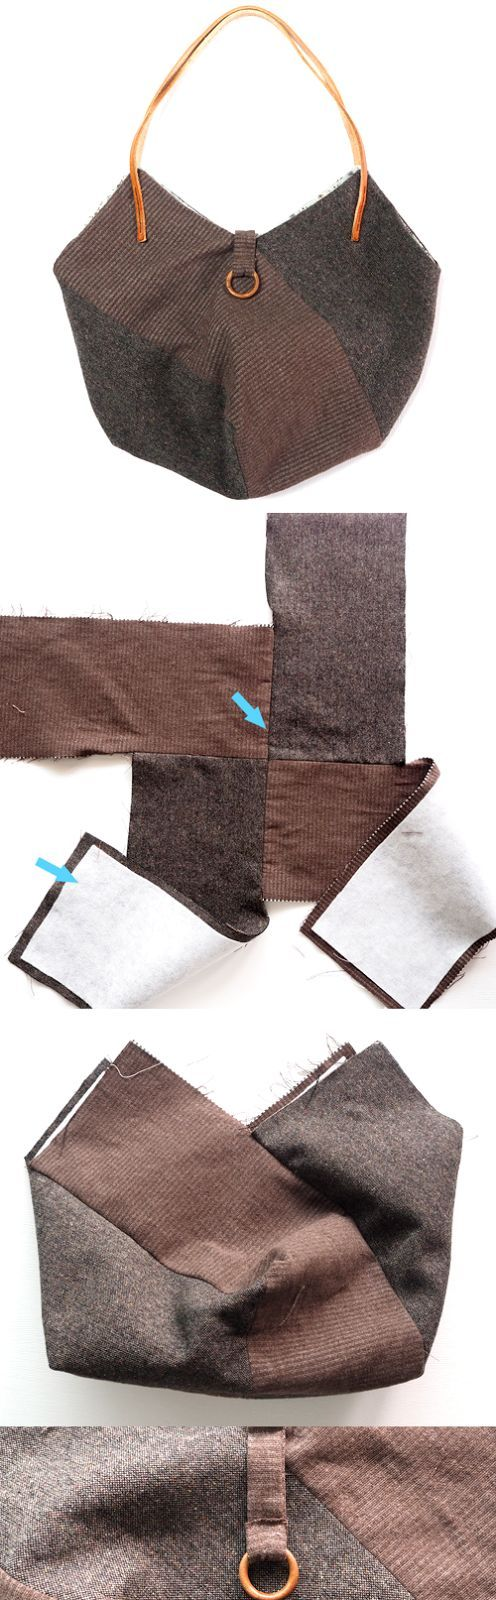 How to Sew a Hobo Bag   http://www.handmadiya.com/2016/11/how-to-sew-hobo-bag.html